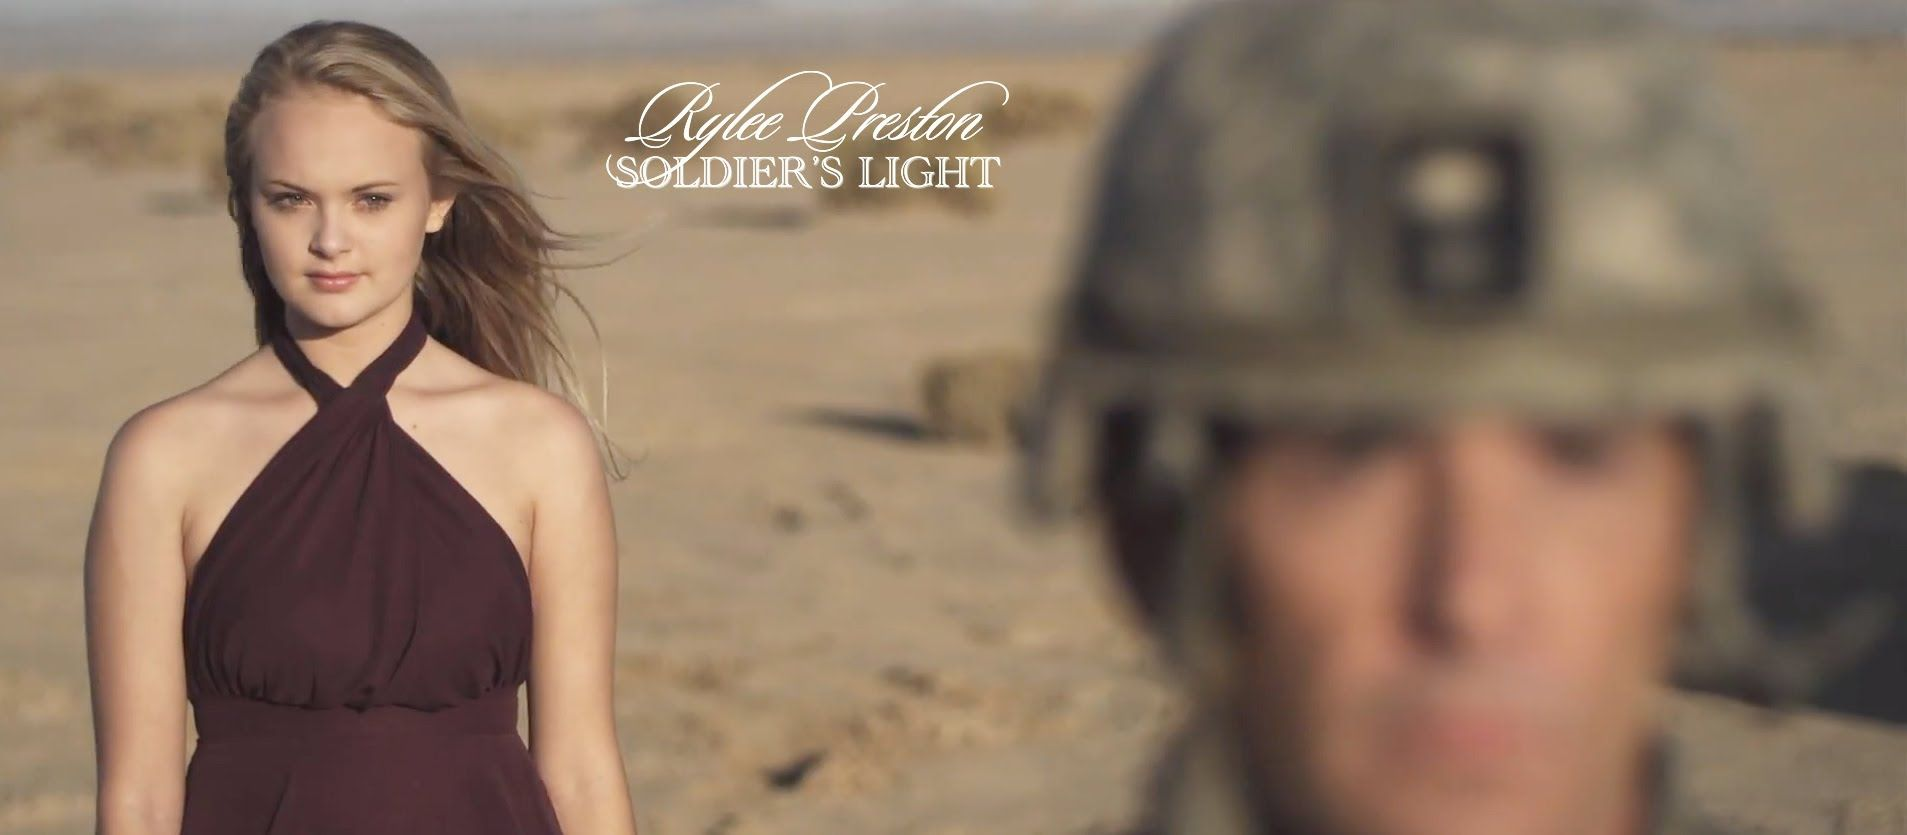 Meet a single soldier